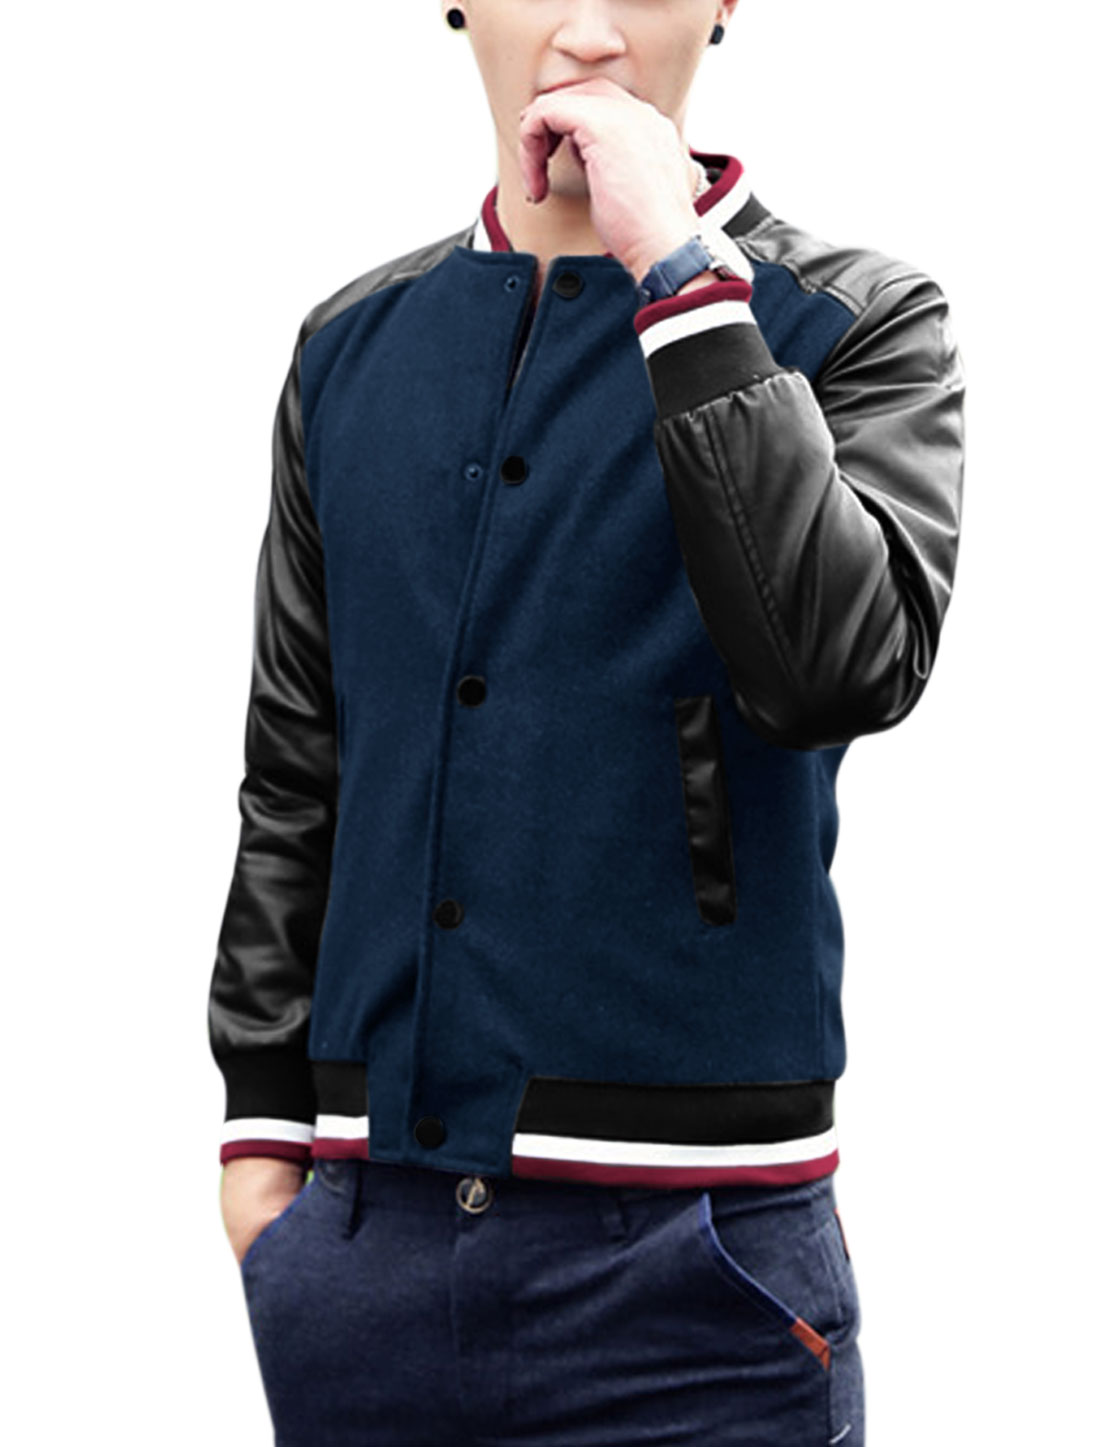 Man Rib Knit Collar Snap Buttons Closure Fashion Jacket Navy Blue M